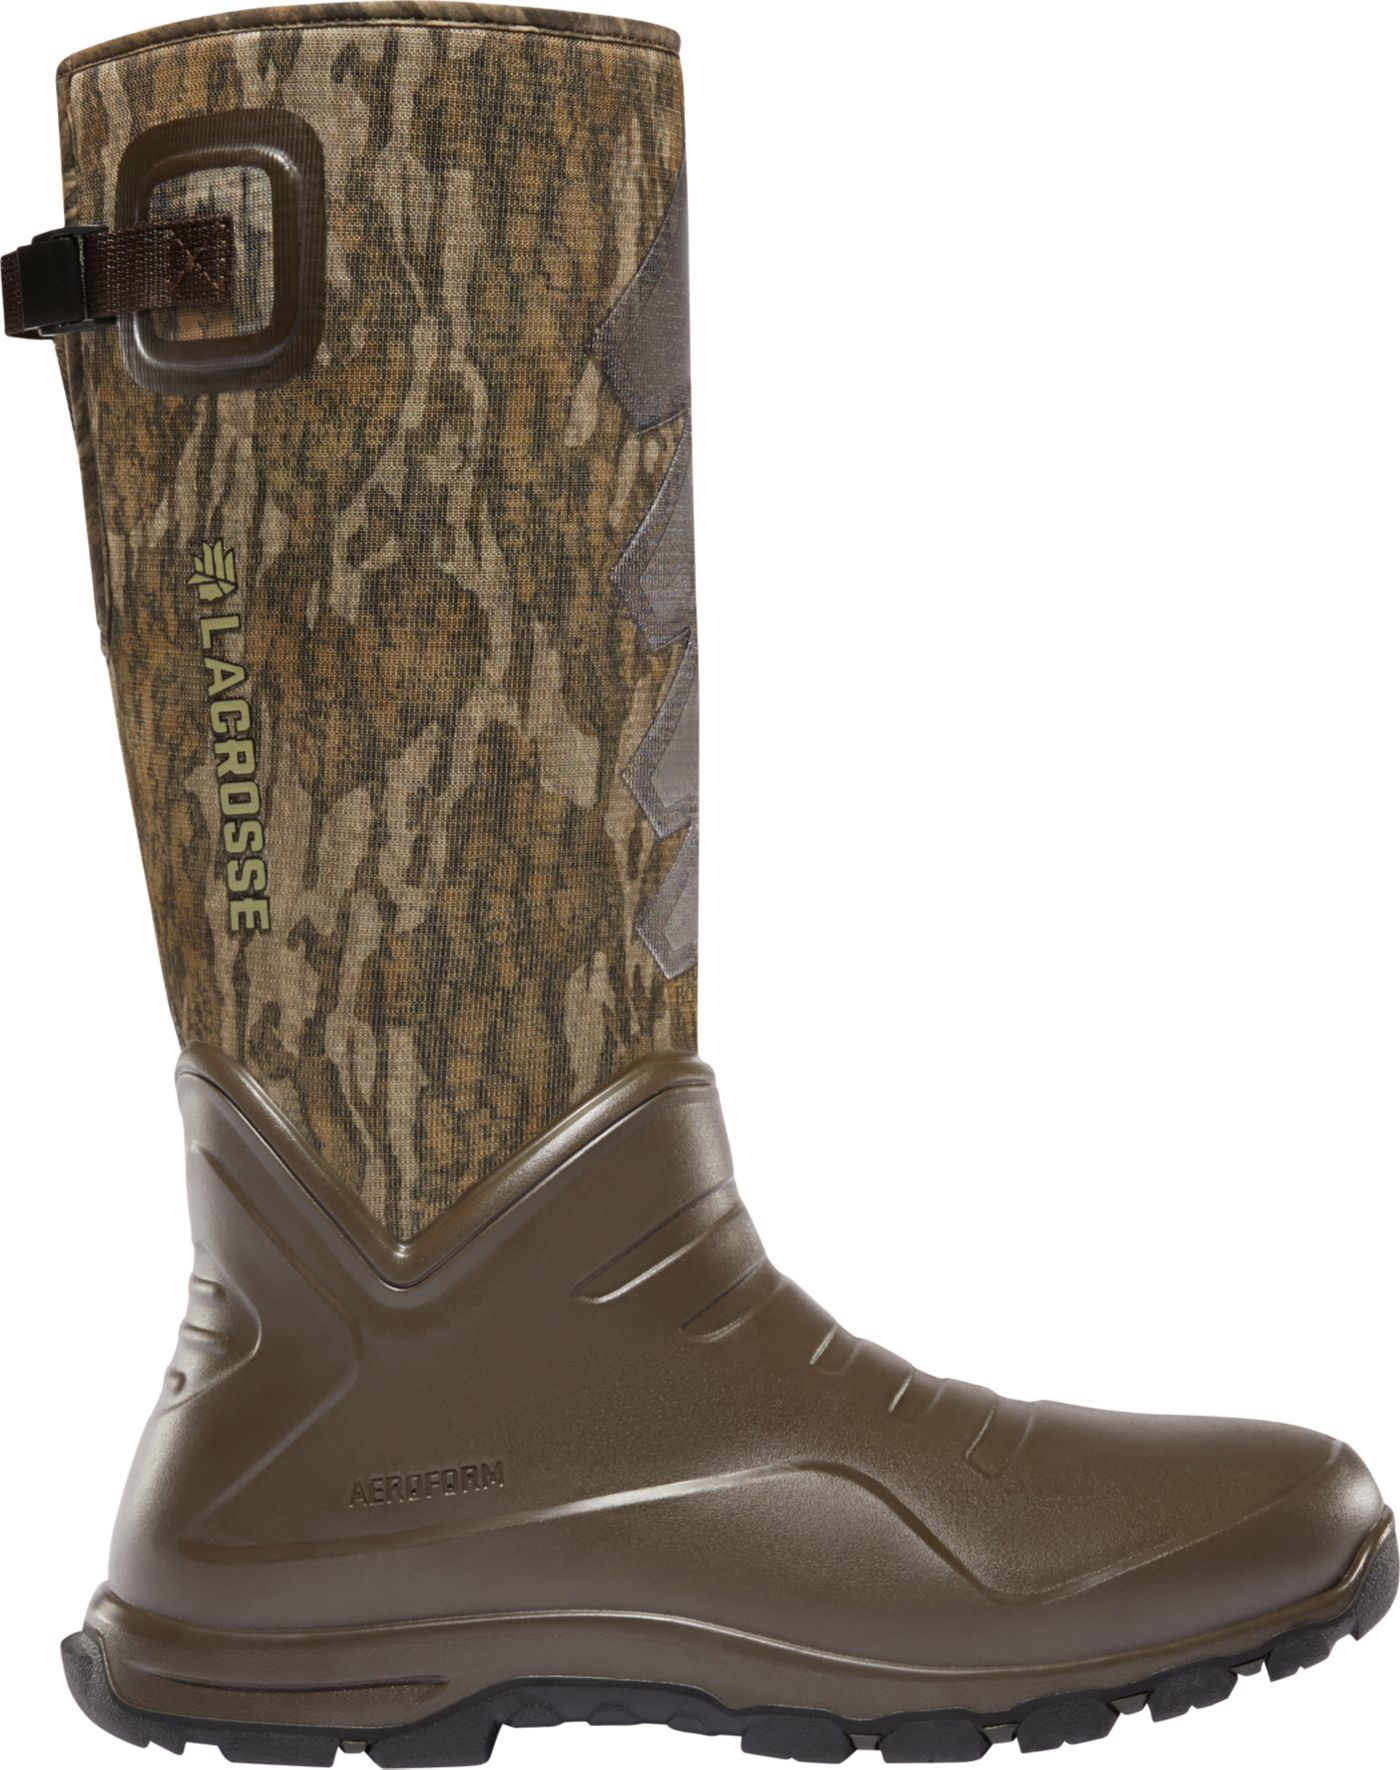 LaCrosse Men's Aerohead Sport Mossy Oak Bottomland 7mm Rubber Hunting Boots